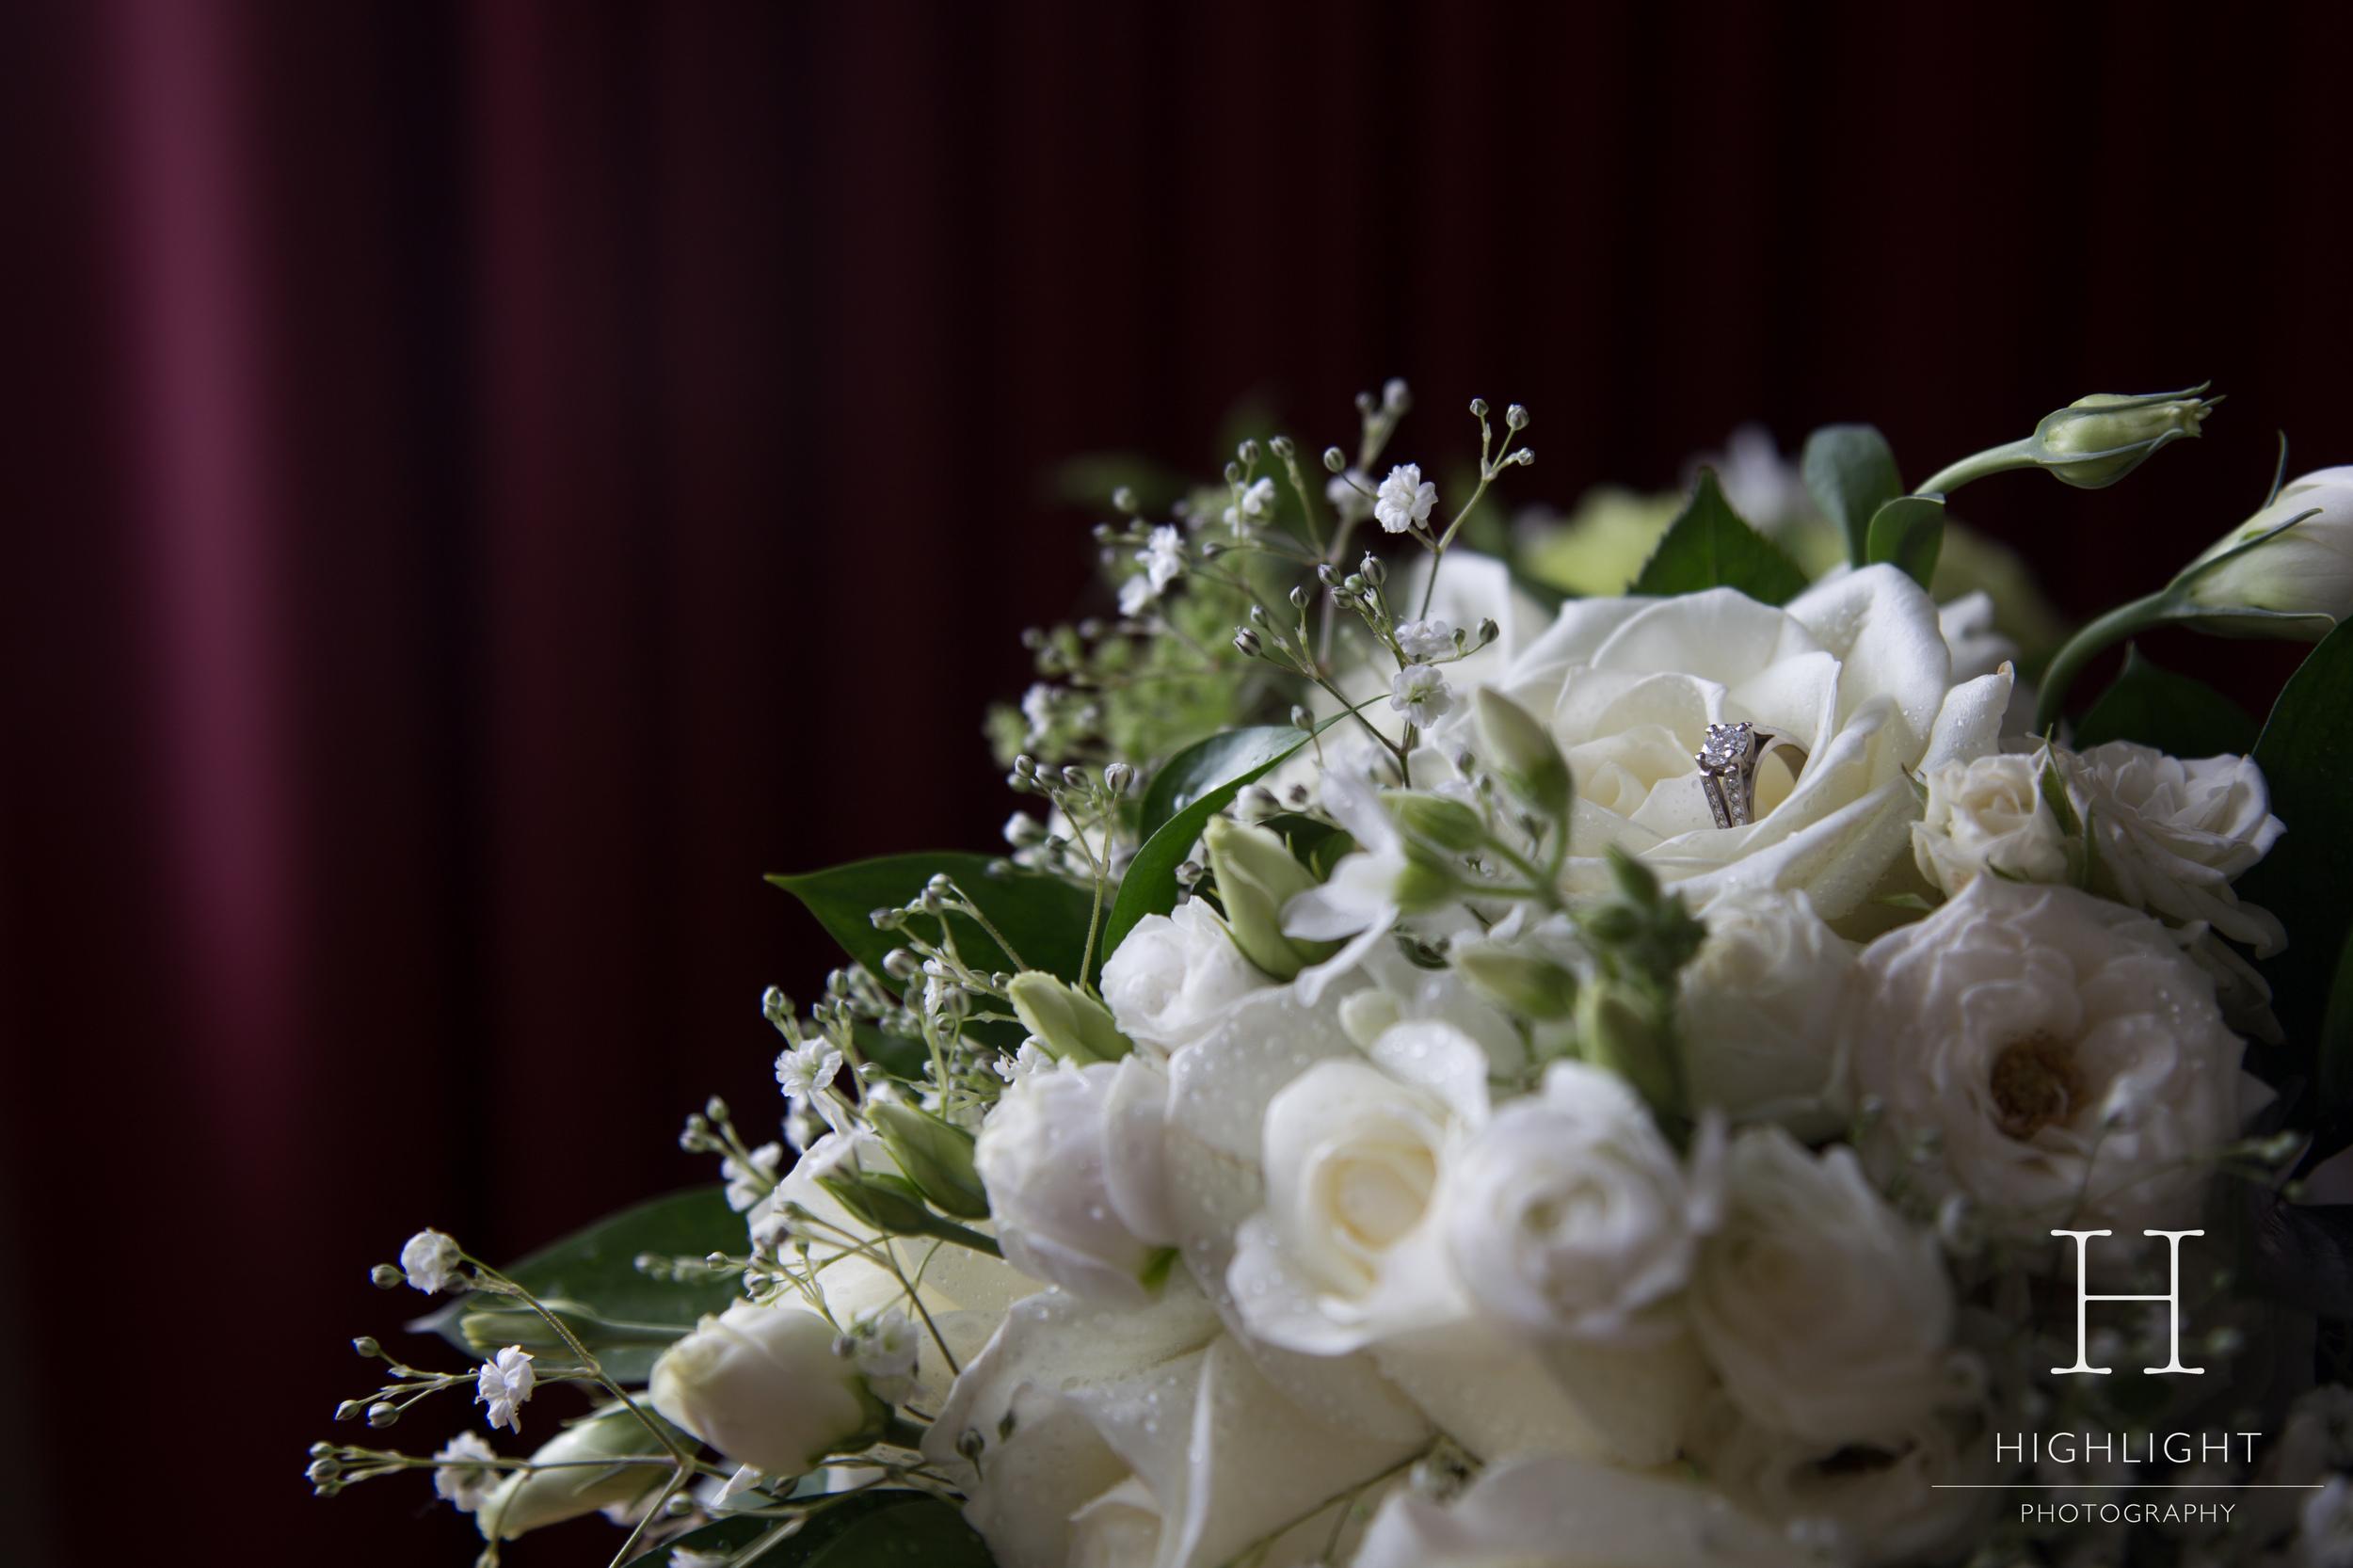 highlight_photography_new_zealand_flowers.jpg